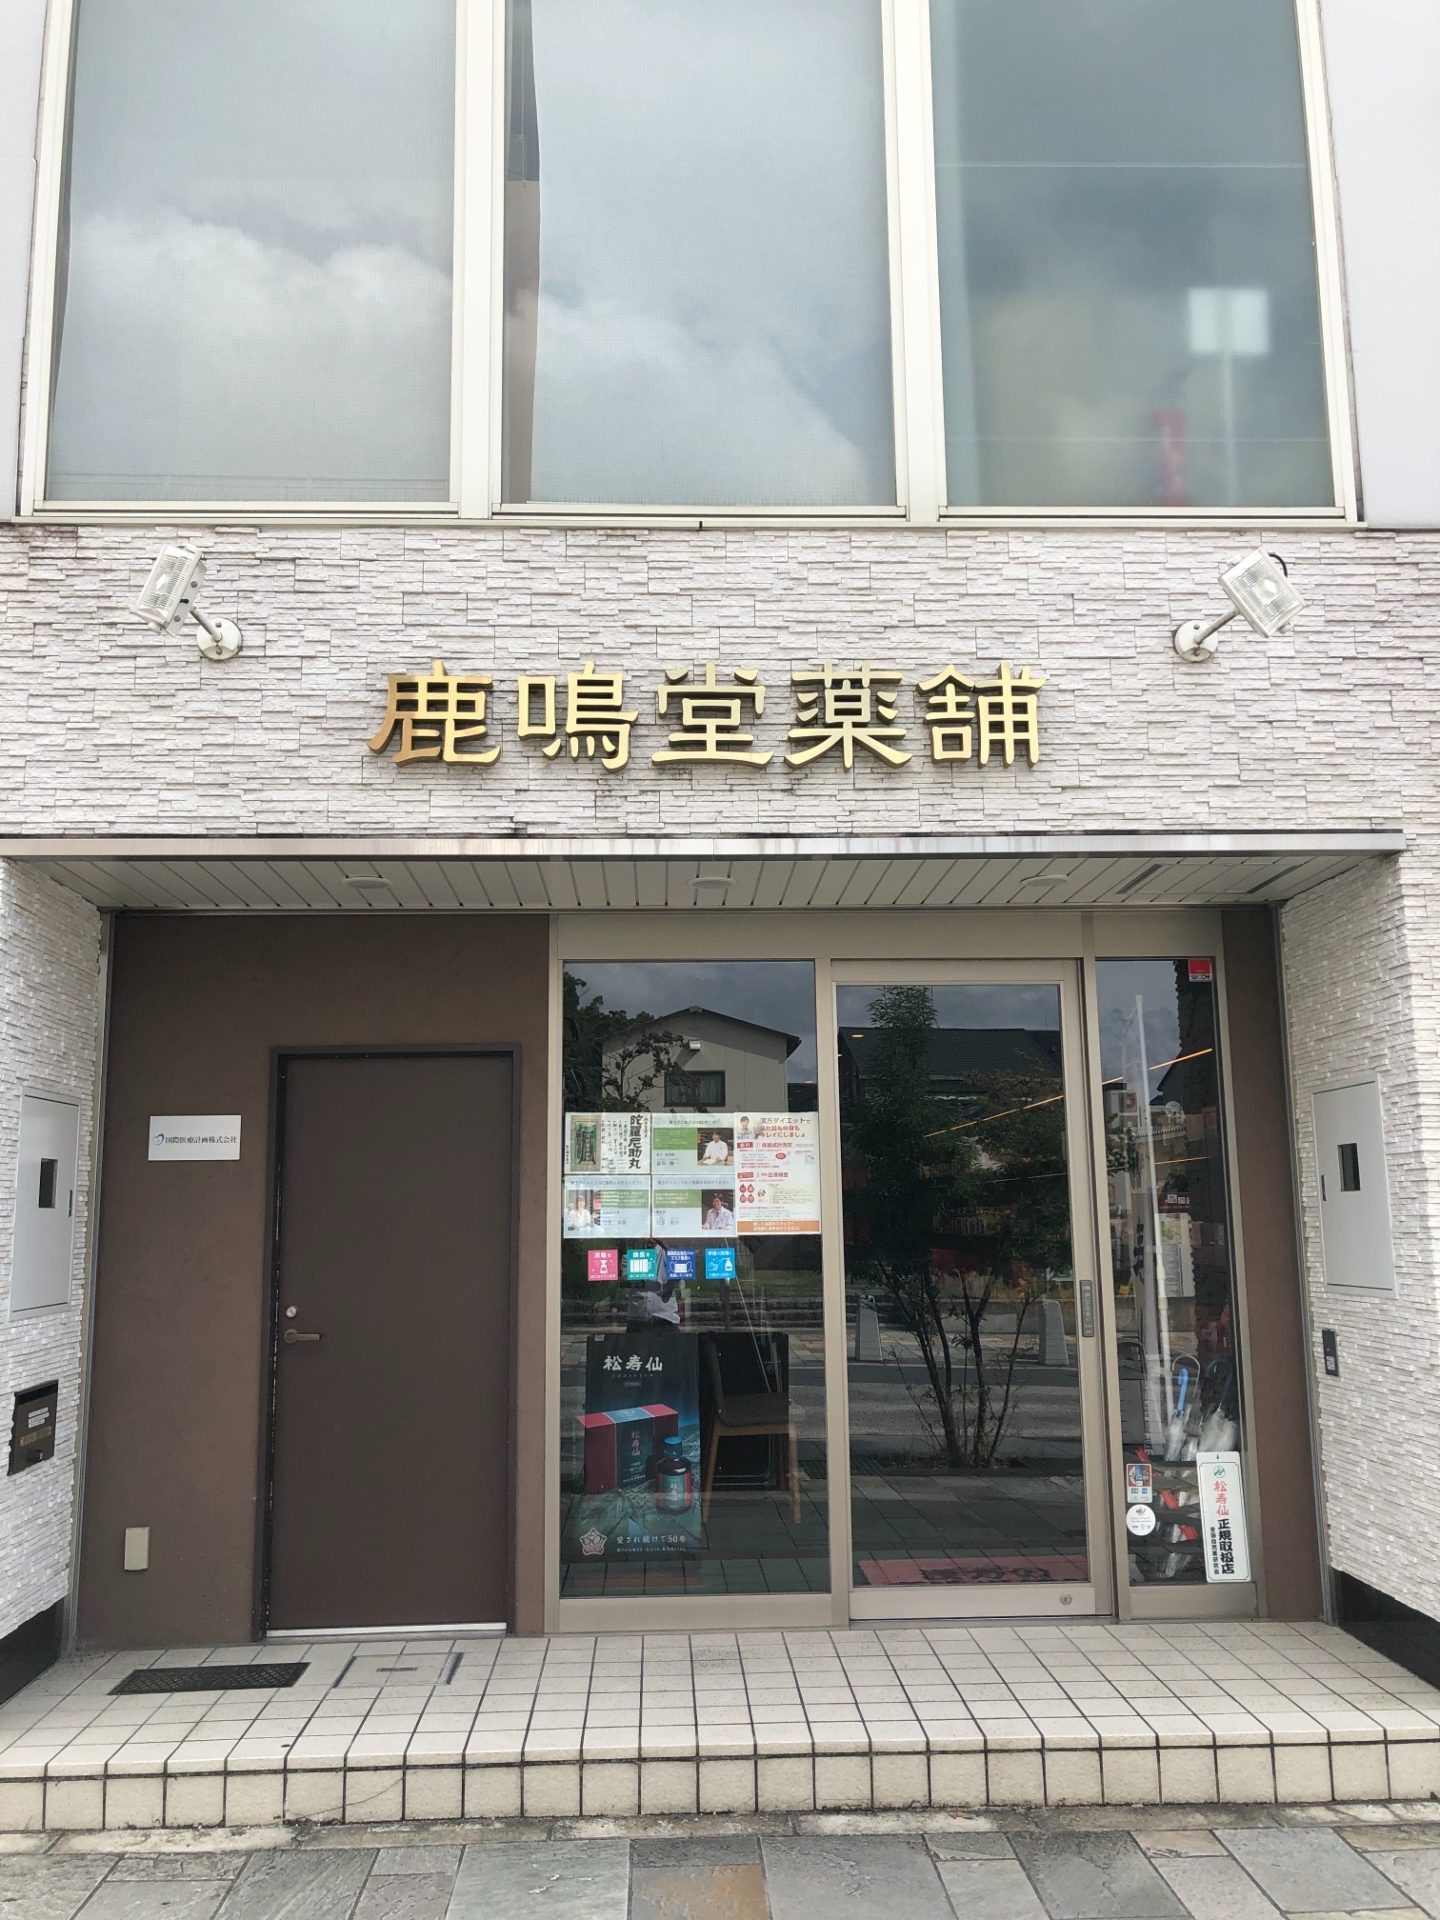 漢方の鹿鳴堂薬舗